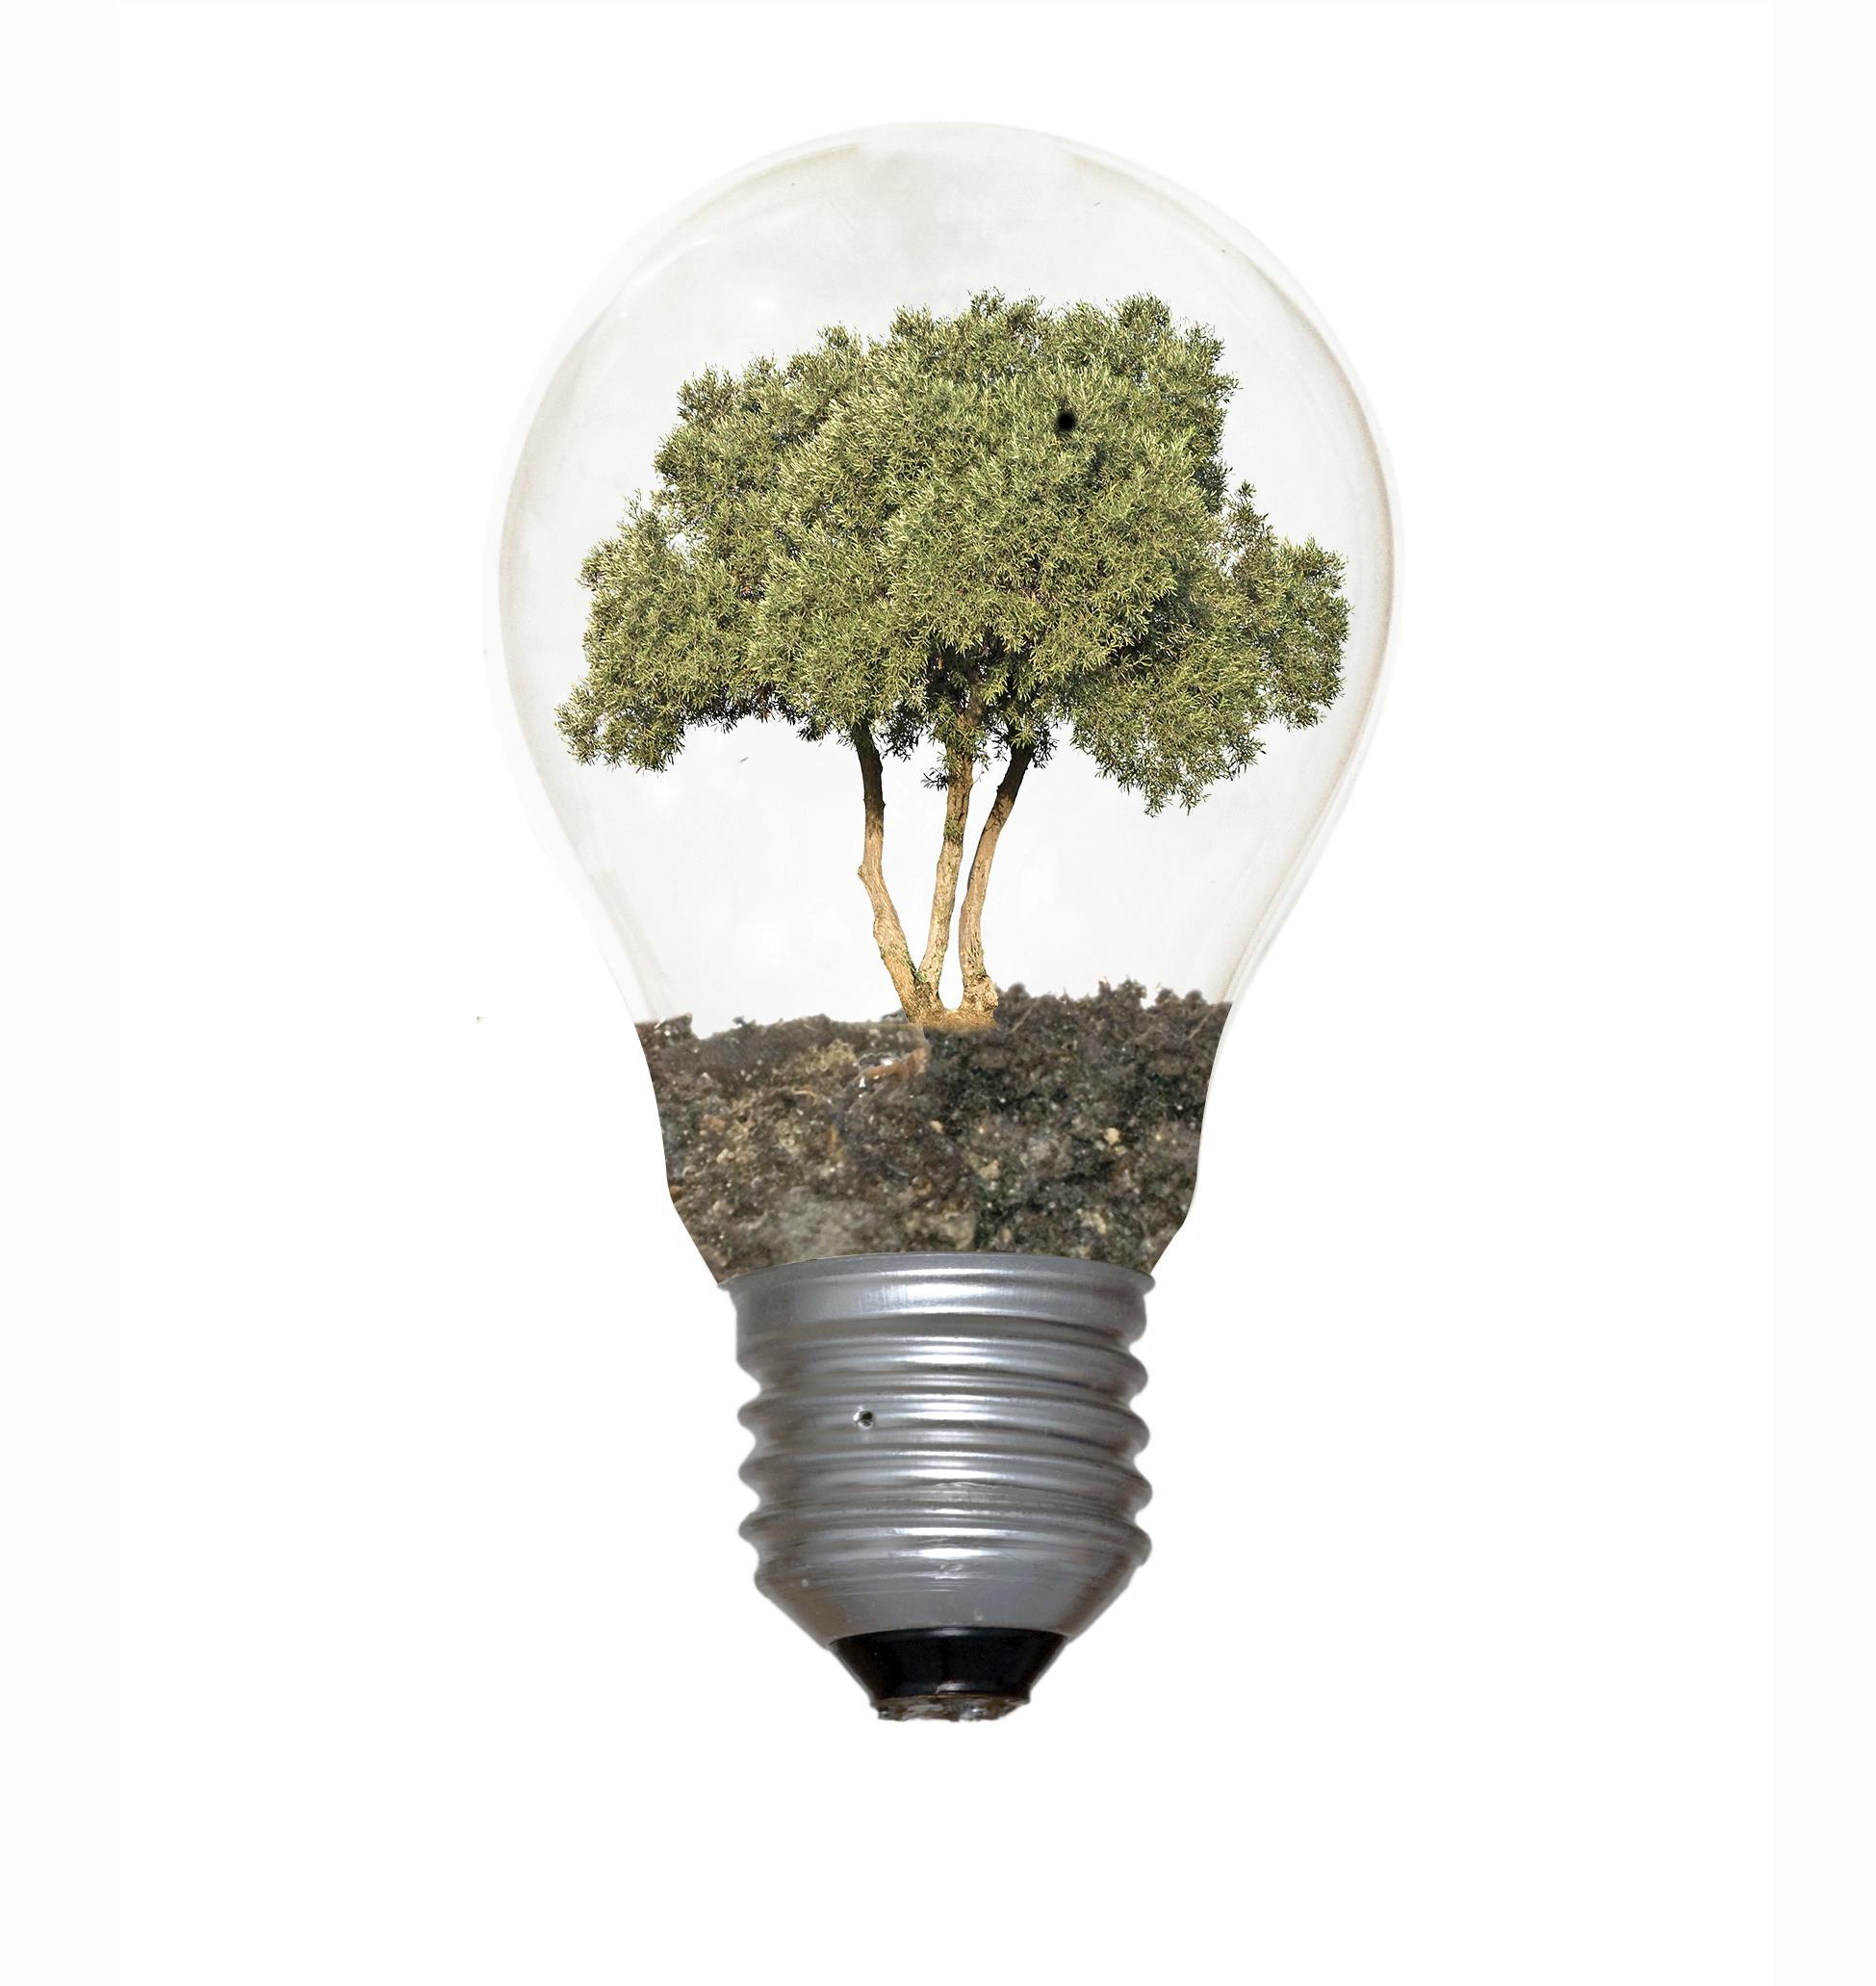 Plant intelligence